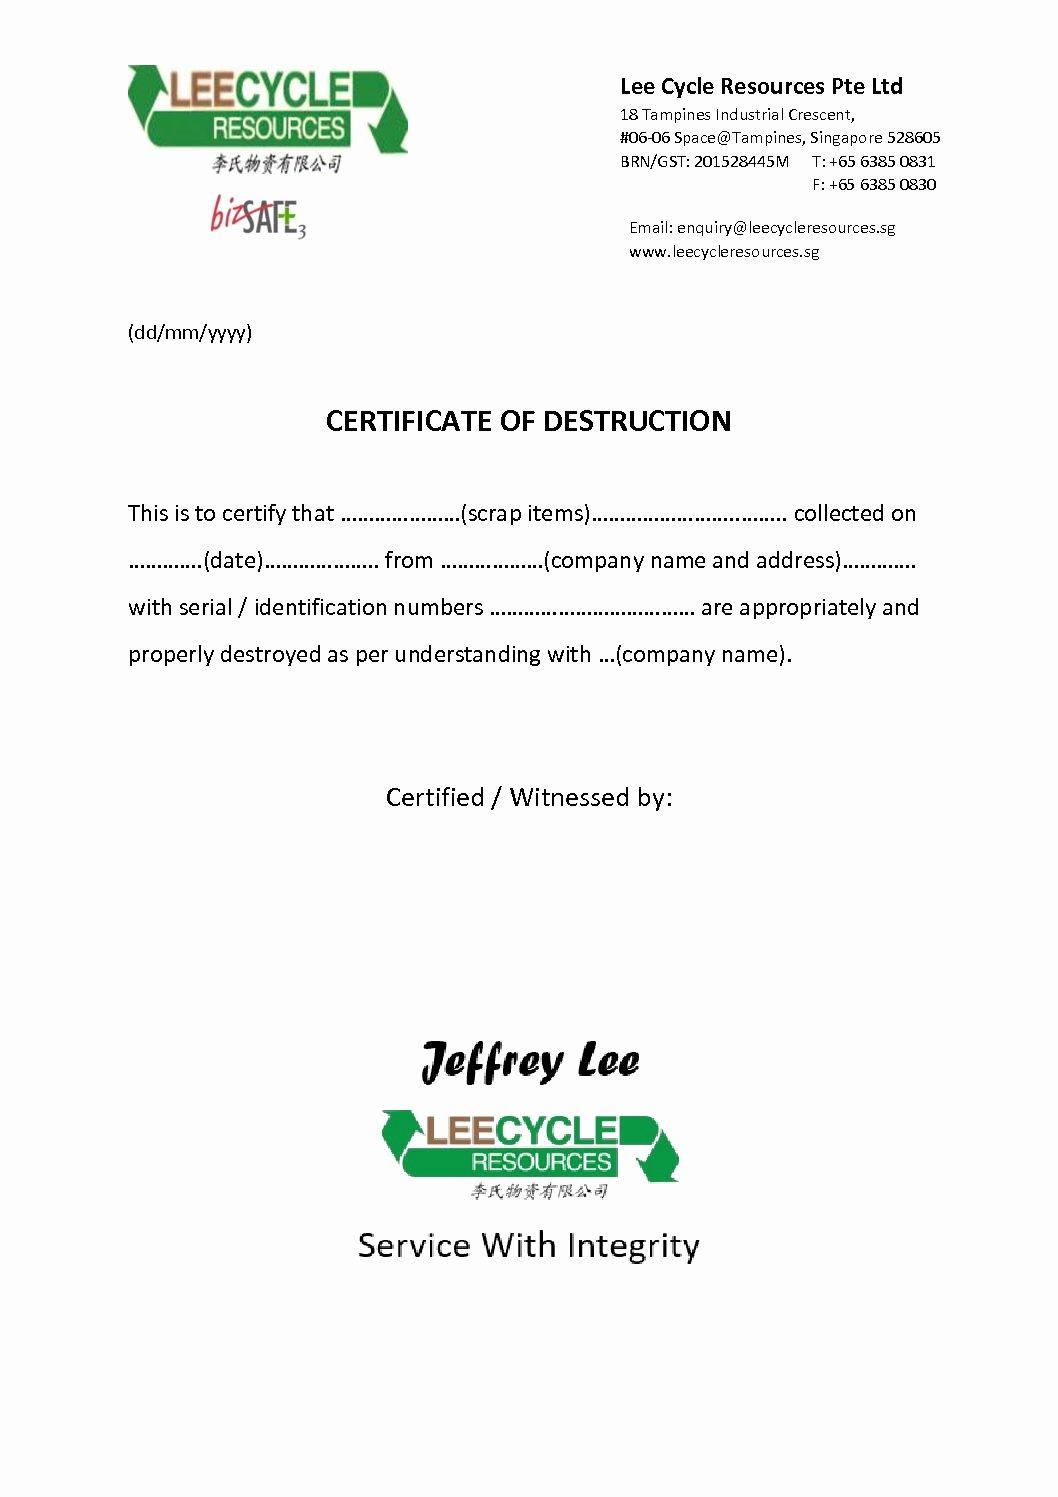 Certificate Destruction Leecycle Resources Singapore